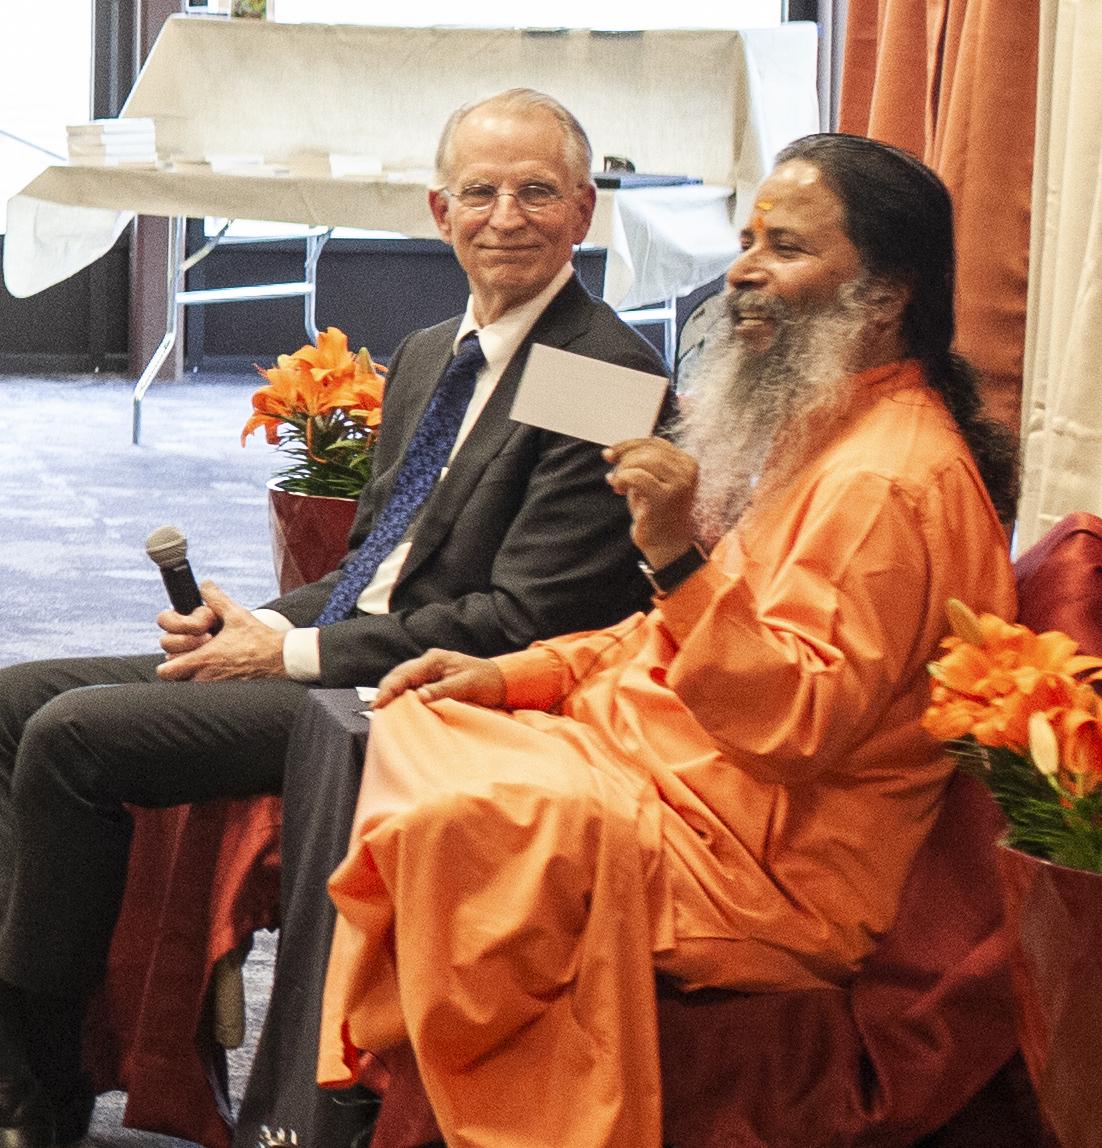 Ron & Swami.jpg